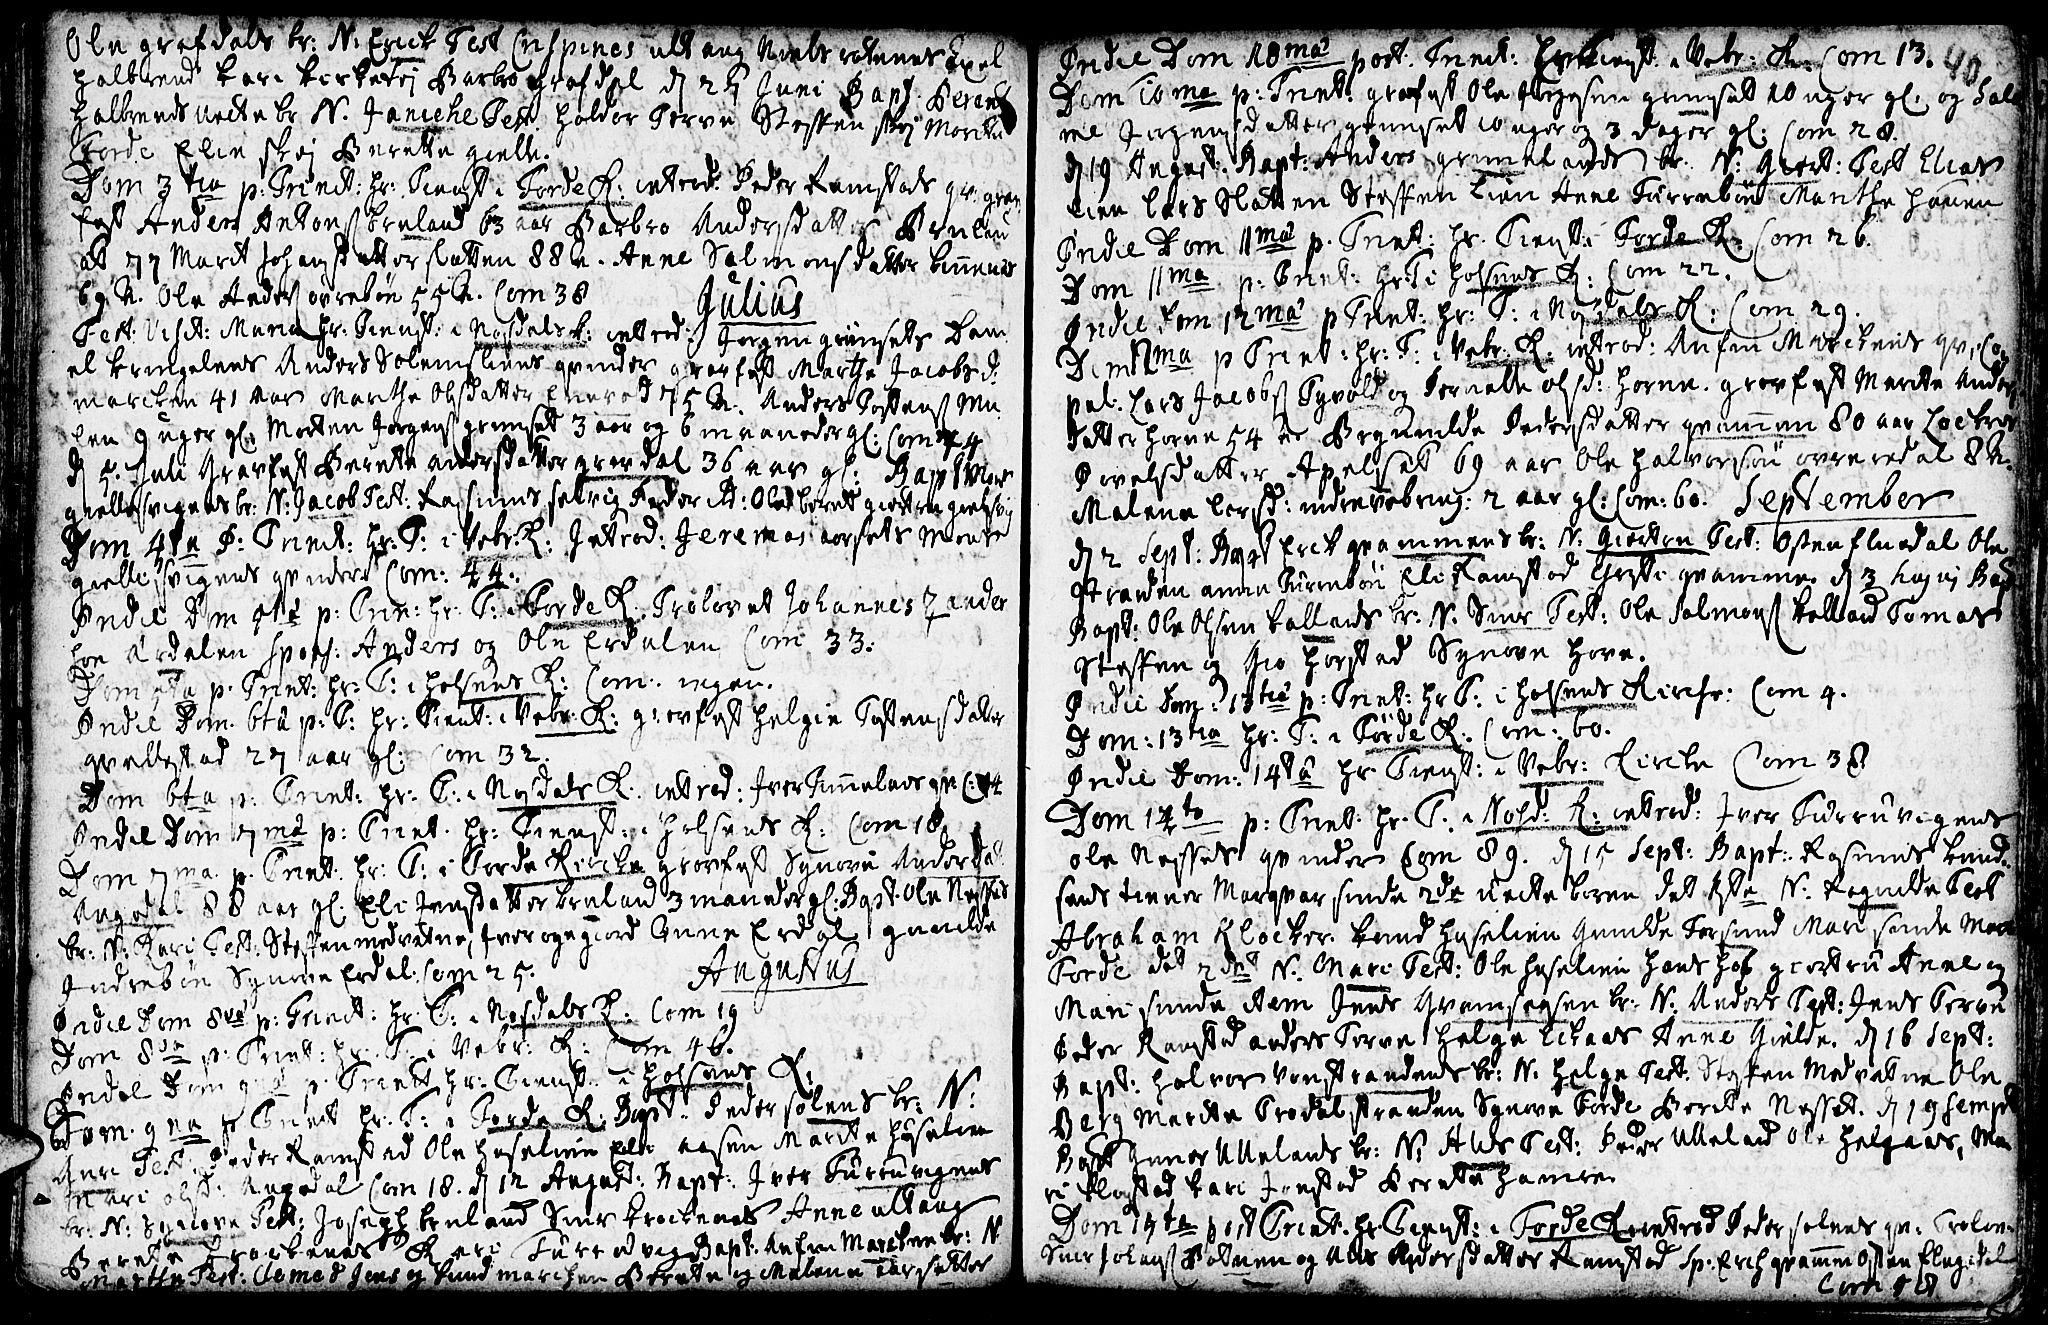 SAB, Førde sokneprestembete, H/Haa: Ministerialbok nr. A 2, 1728-1748, s. 40